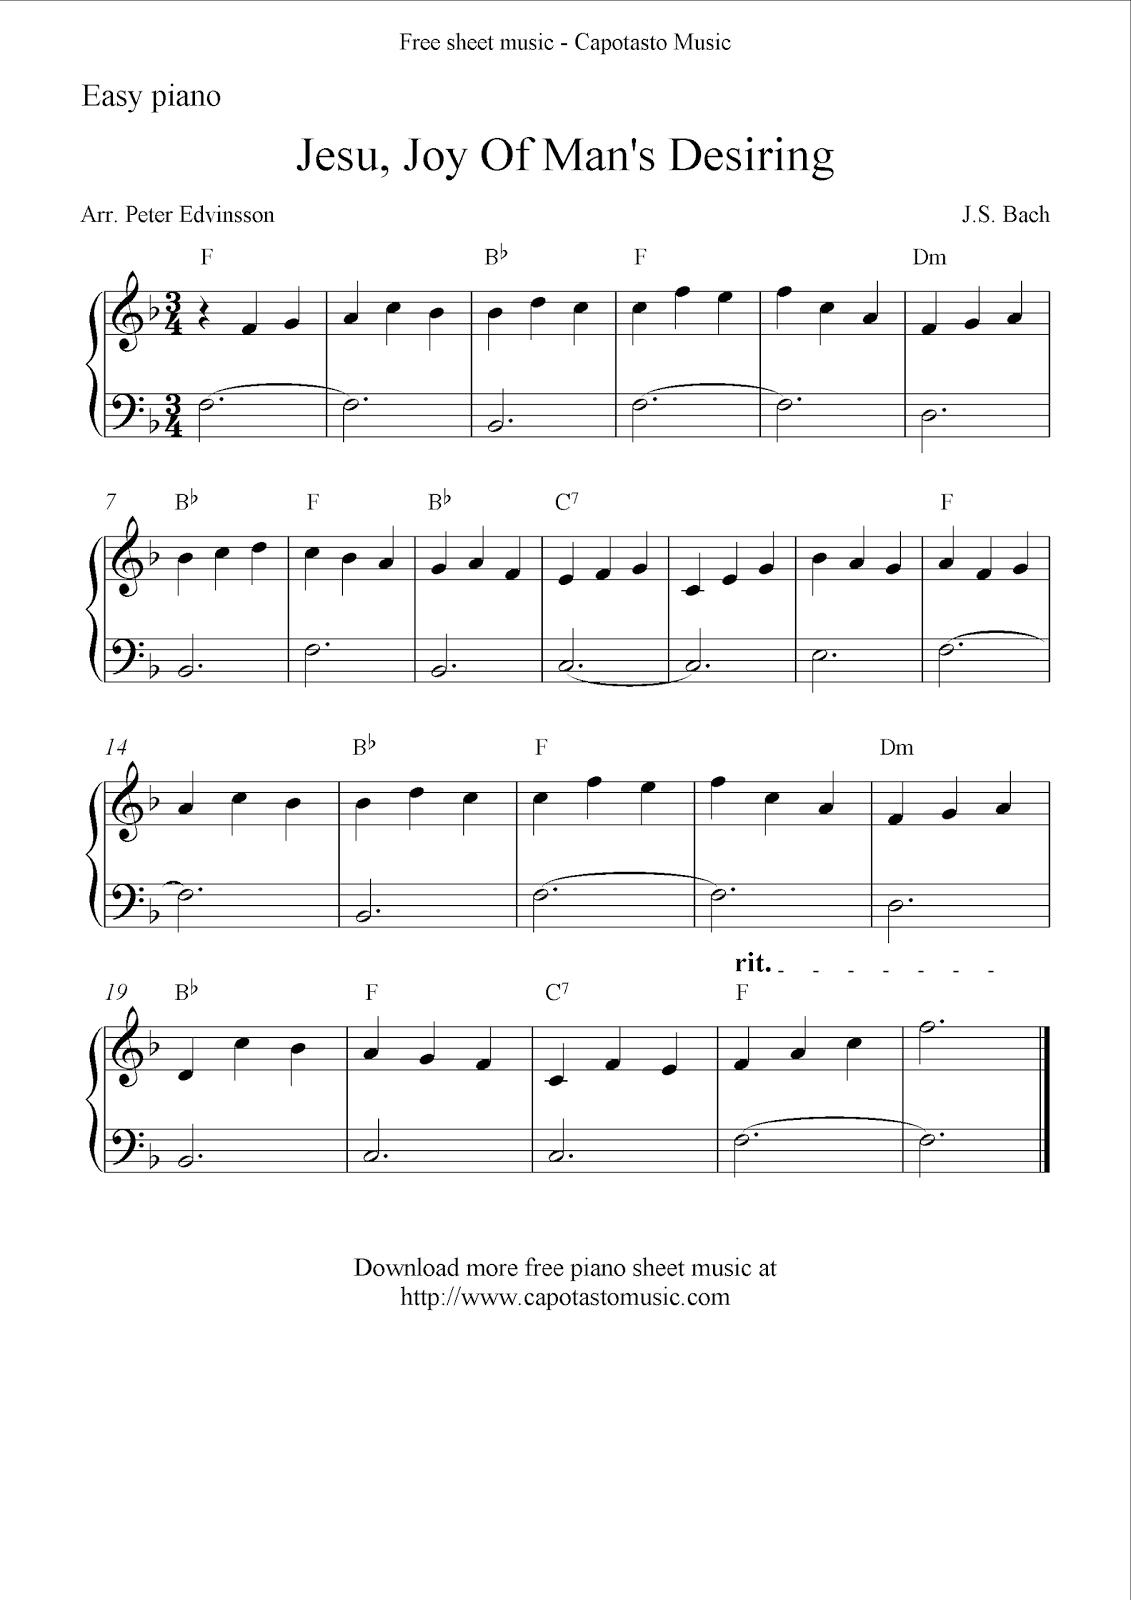 Free easy piano sheet music solo, Jesu, Joy Of Man's